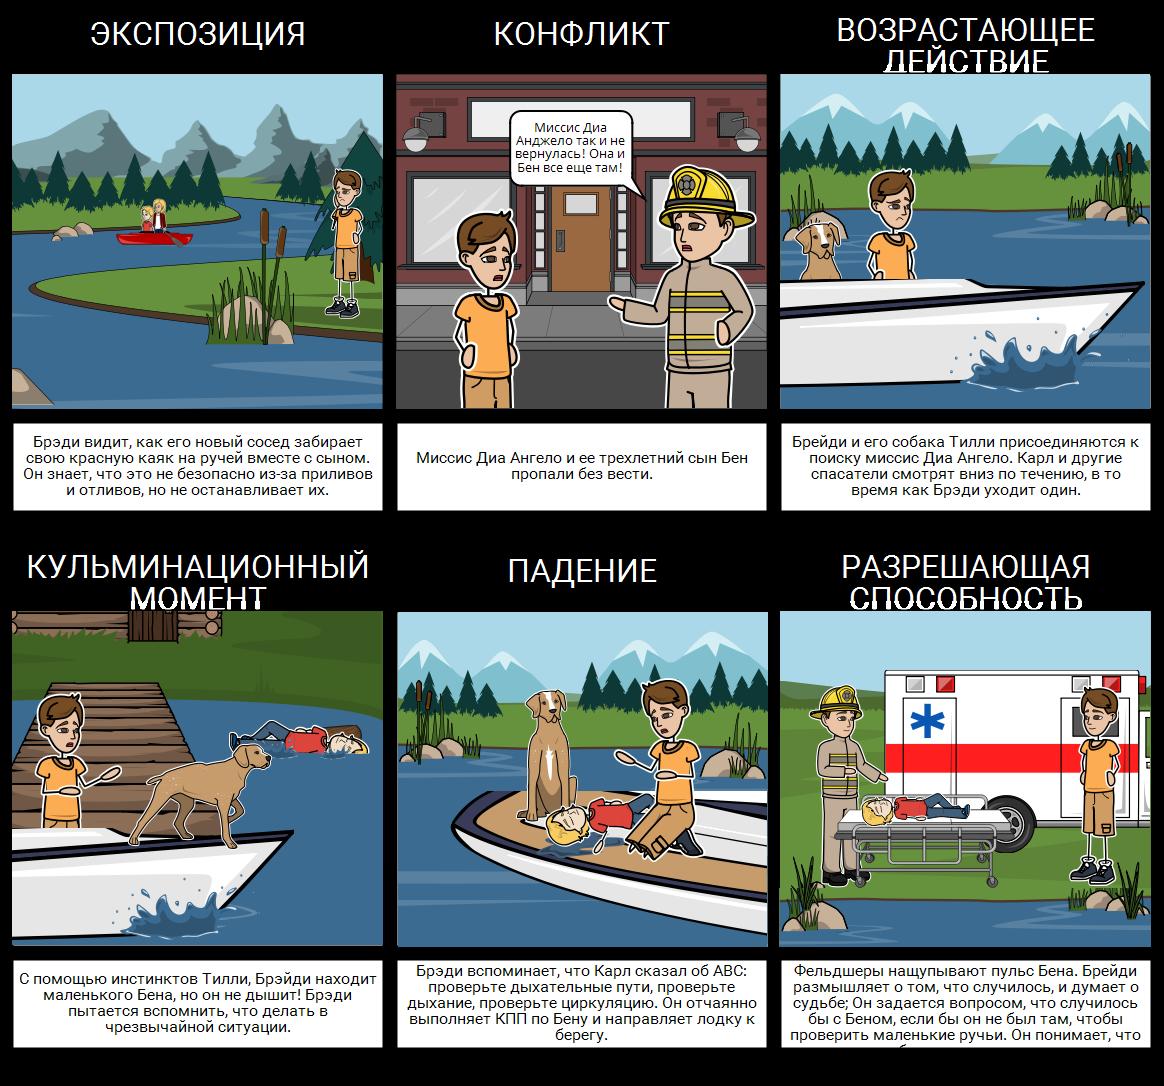 Red Kayak - Земля Диаграмма